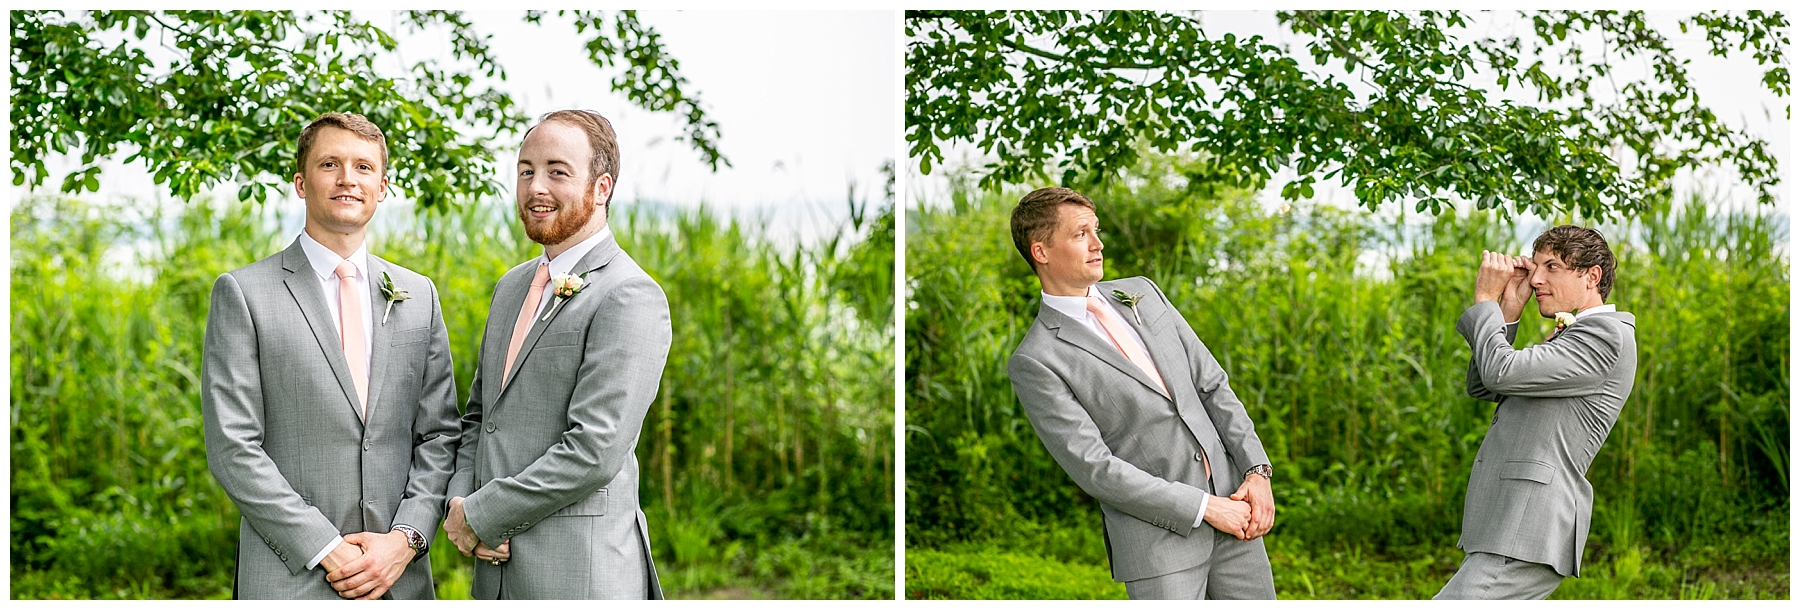 Chelsea Phil Bohemia River Overlook Wedding Living Radiant Photography photos_0073.jpg